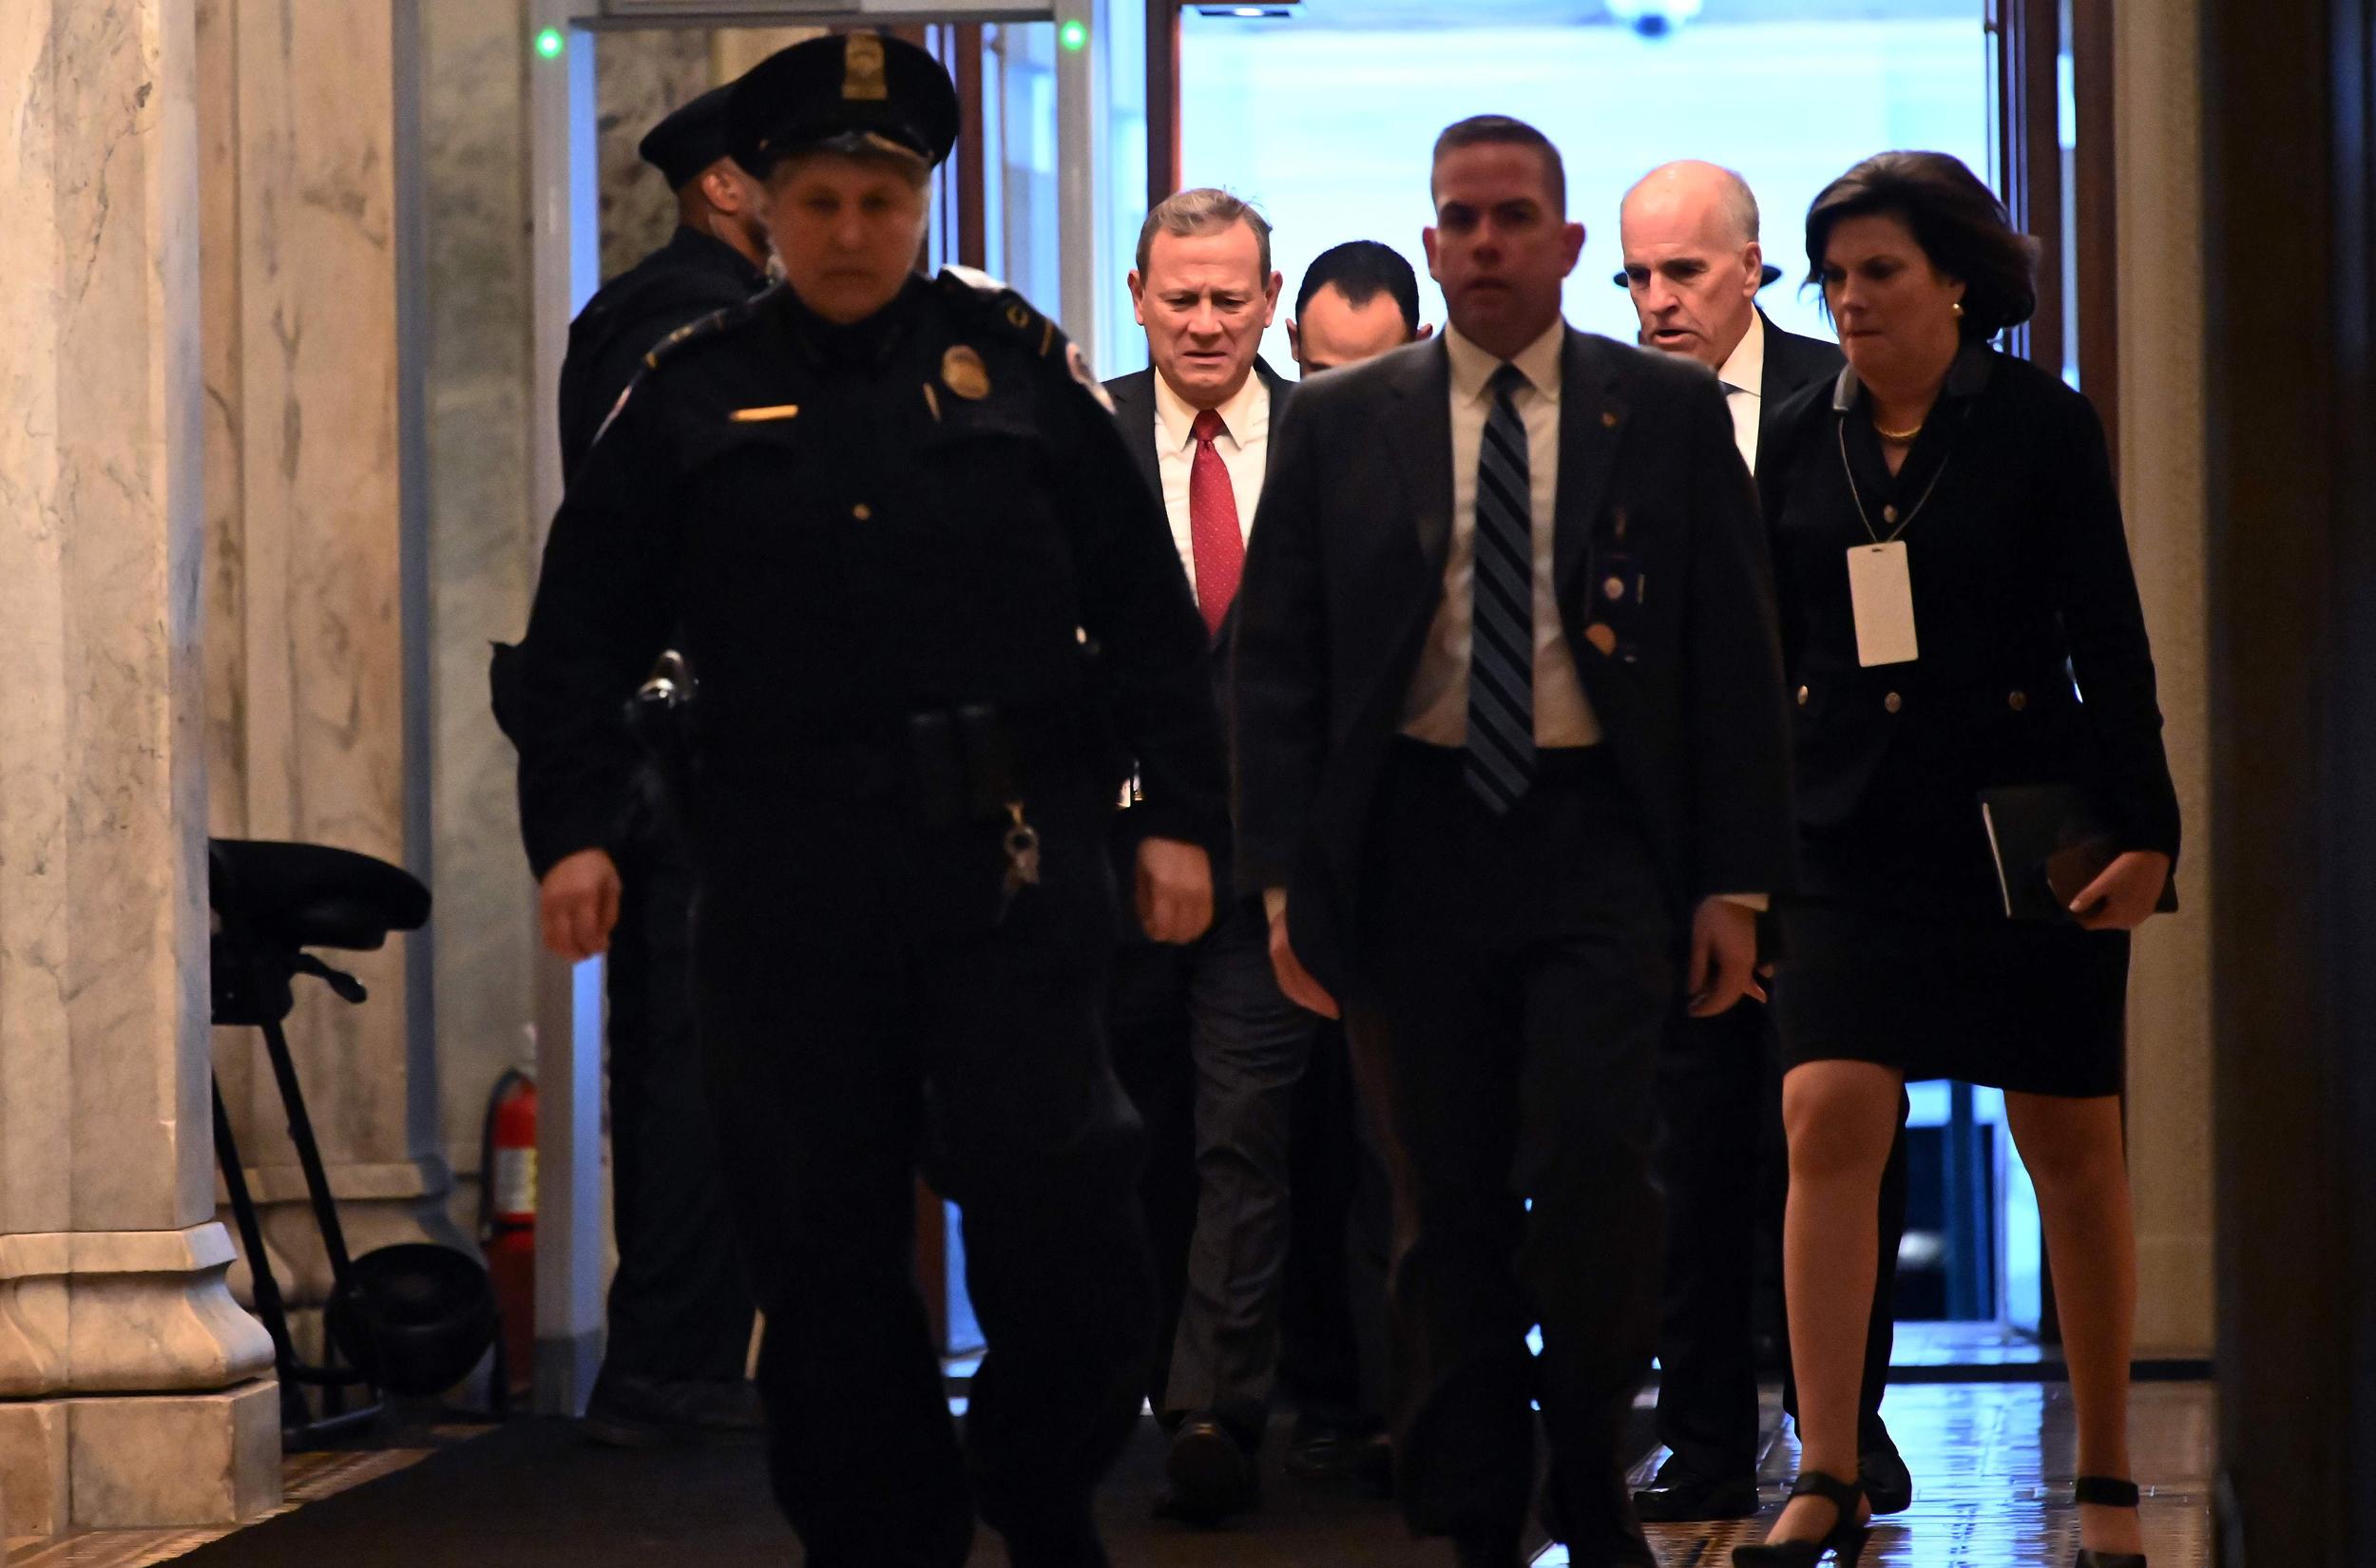 Chief Justice John Roberts Swears In Senators For Trump S Impeachment Trial